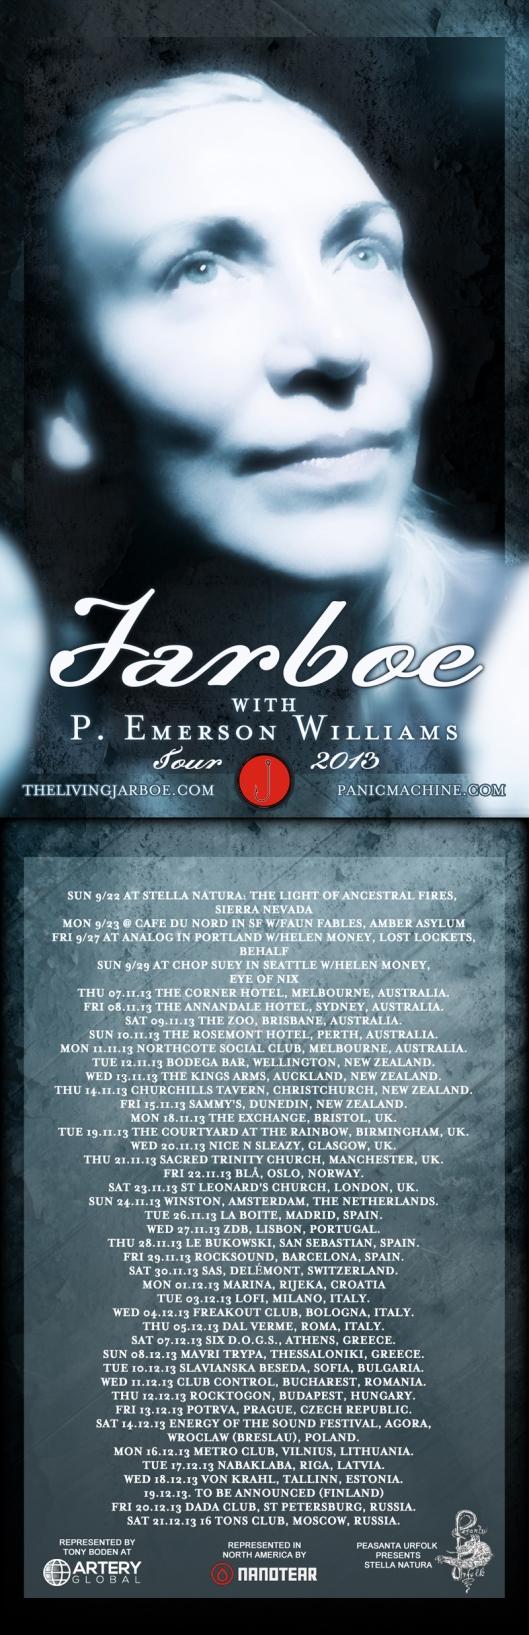 Jarboe & P. Emerson Williams Tour 2013